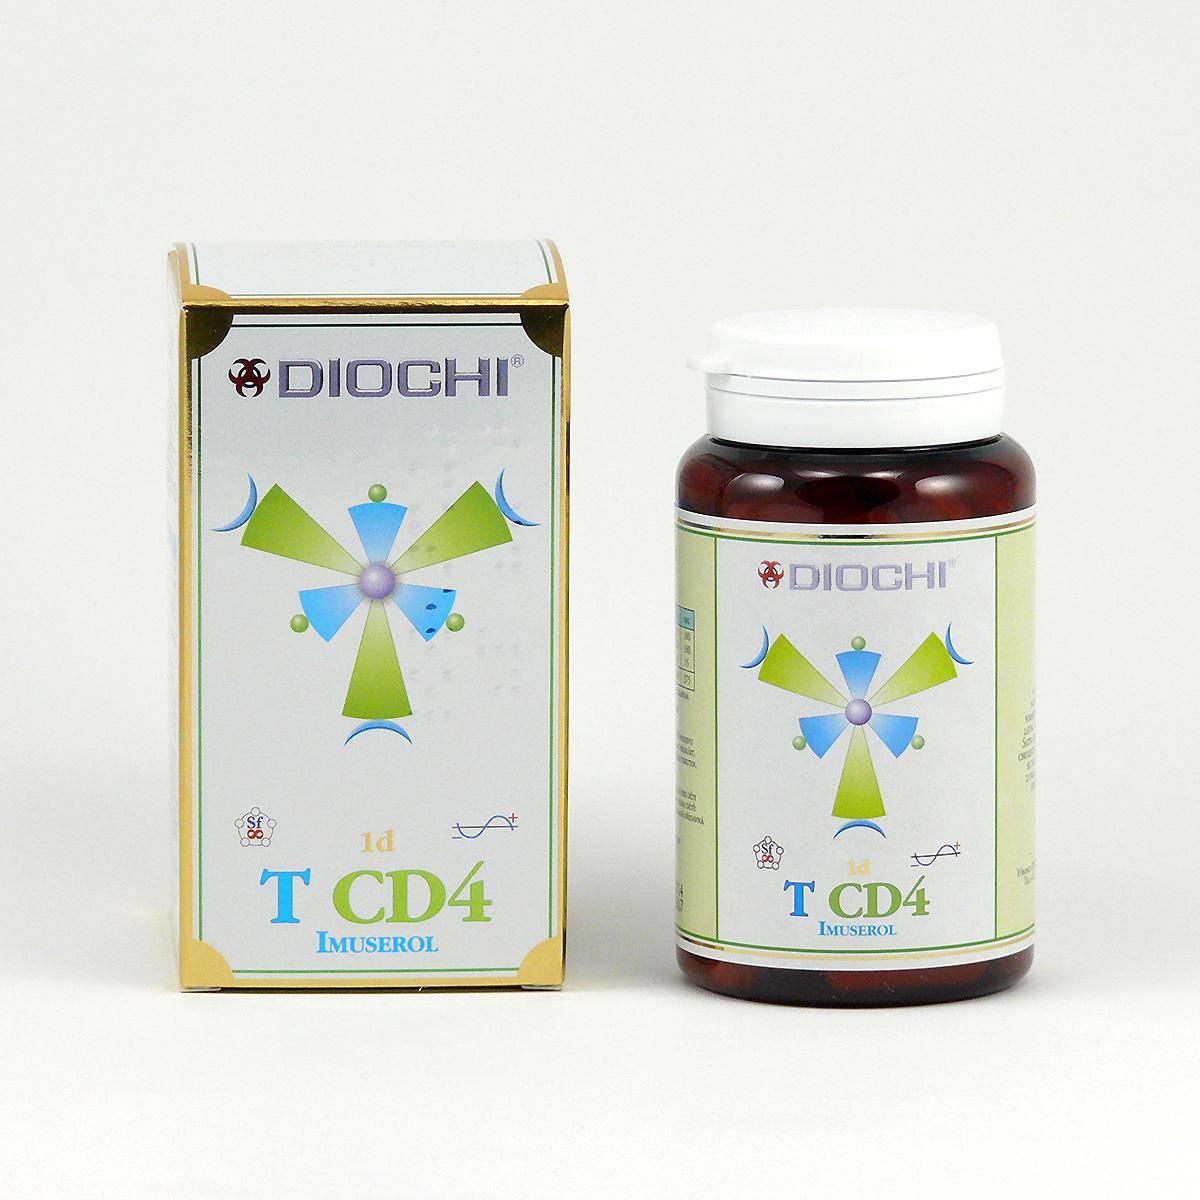 Diochi T CD4 Imuserol, kapsle 80 ks